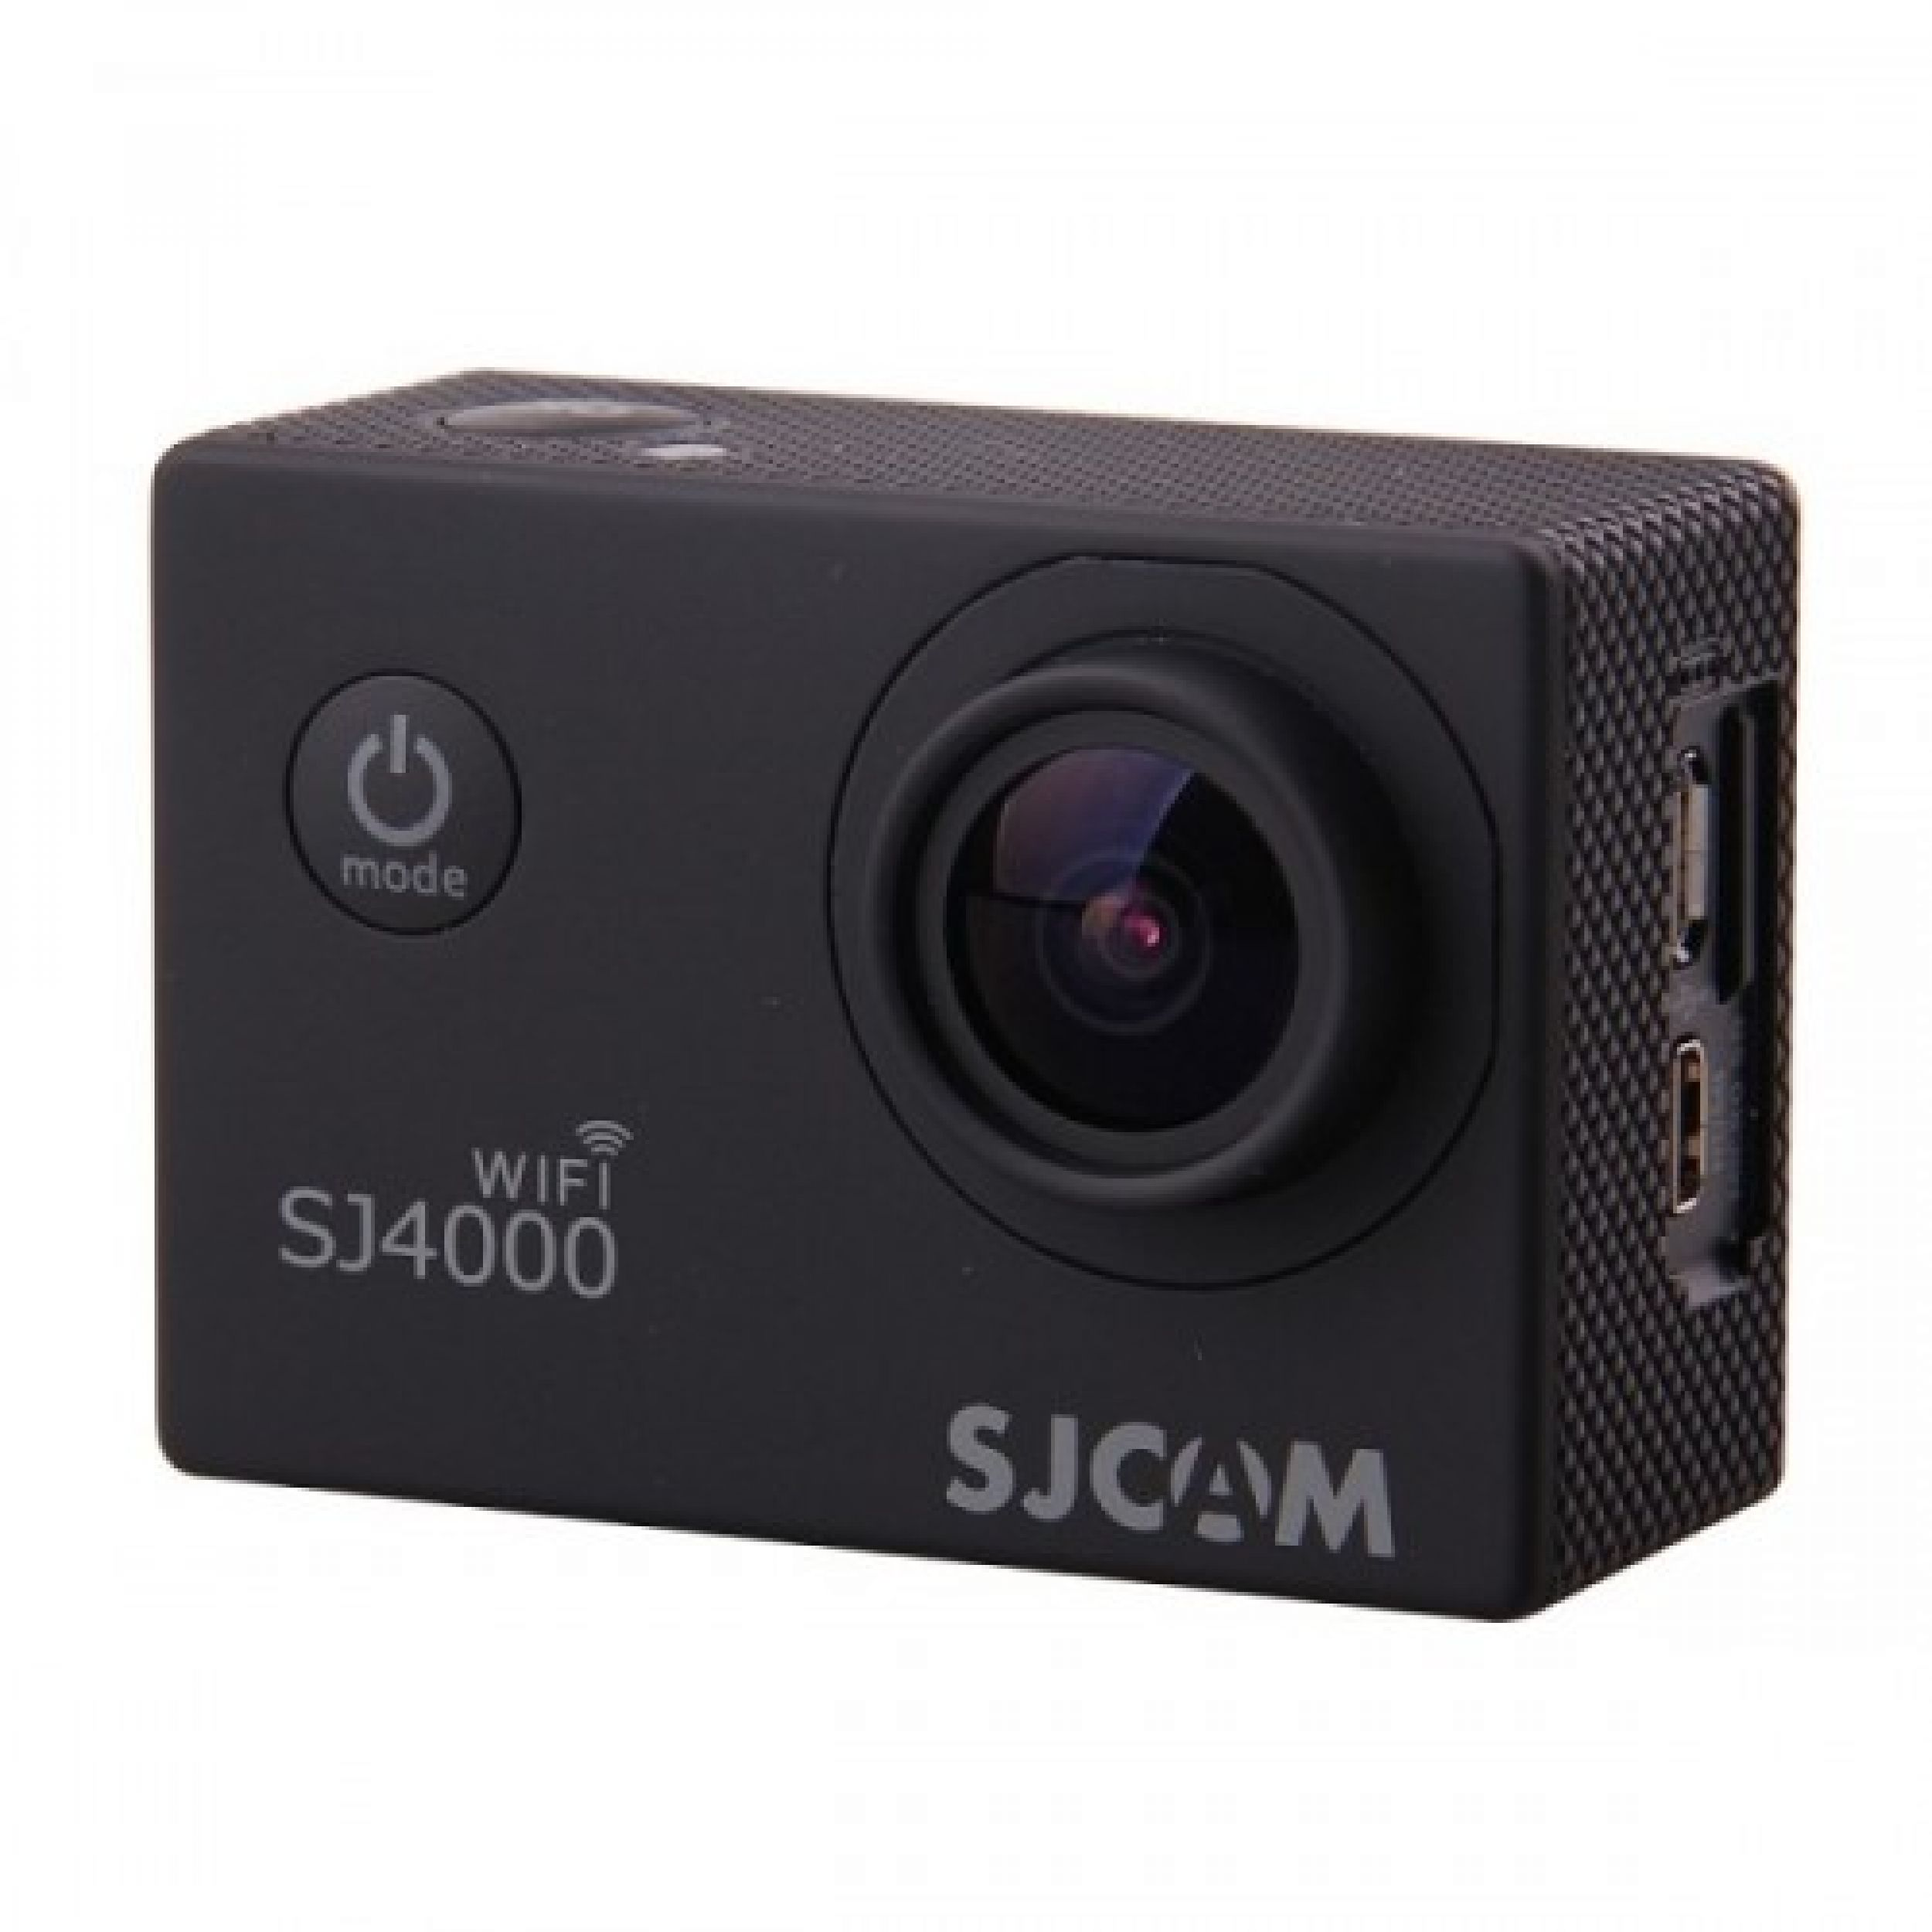 sj4000_wifi_action_camera_LRG-500x500.jpg